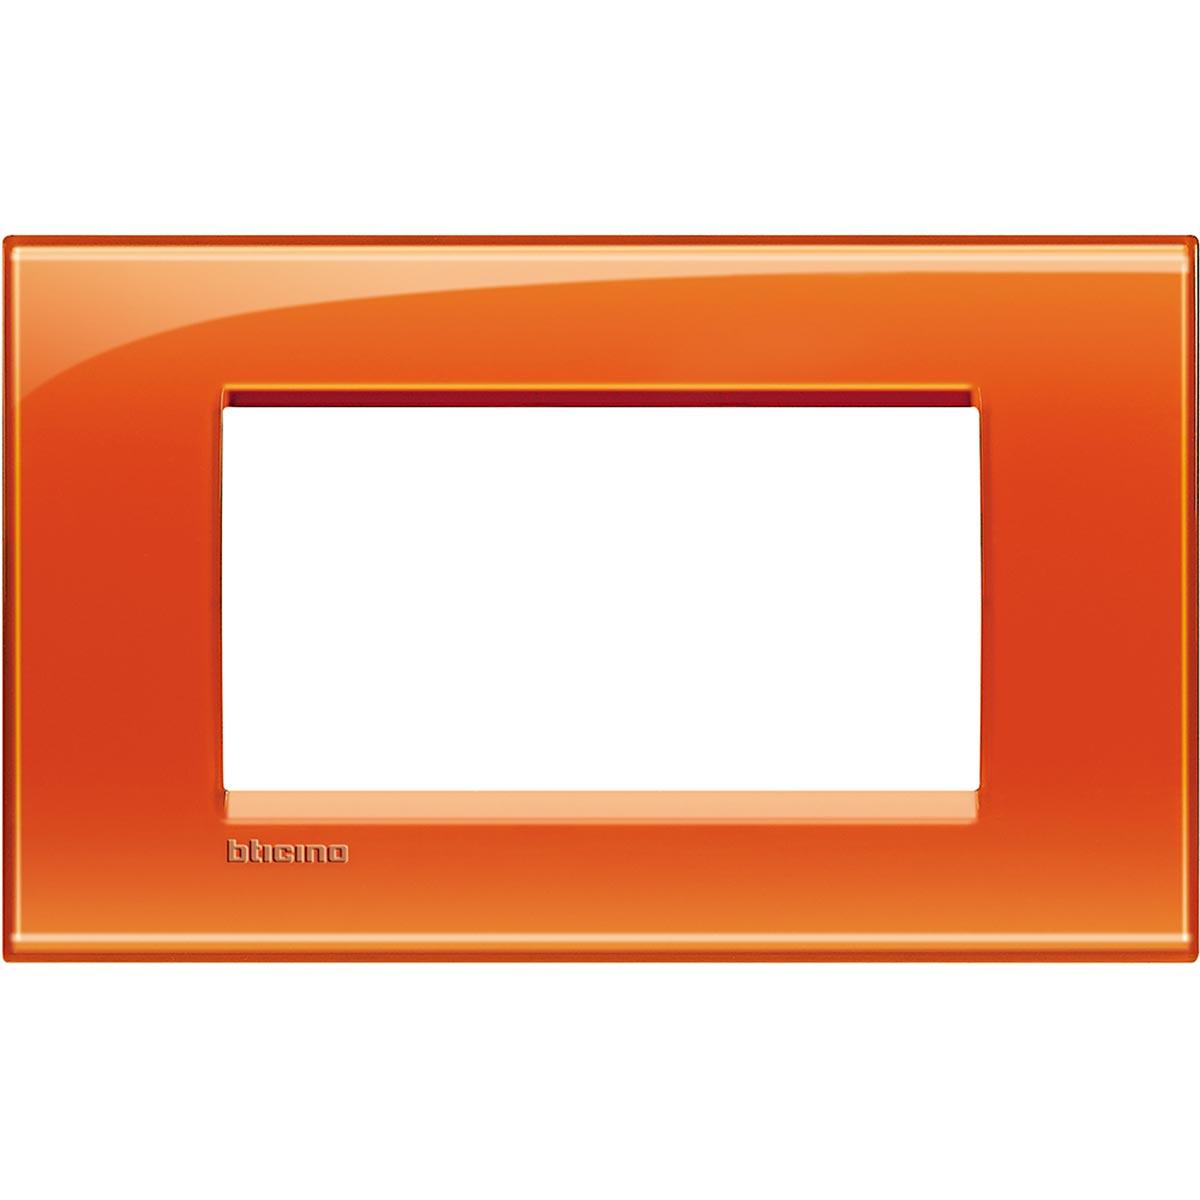 Placca 4 Moduli Arancio Deep Bticino Living International LNA4804OD